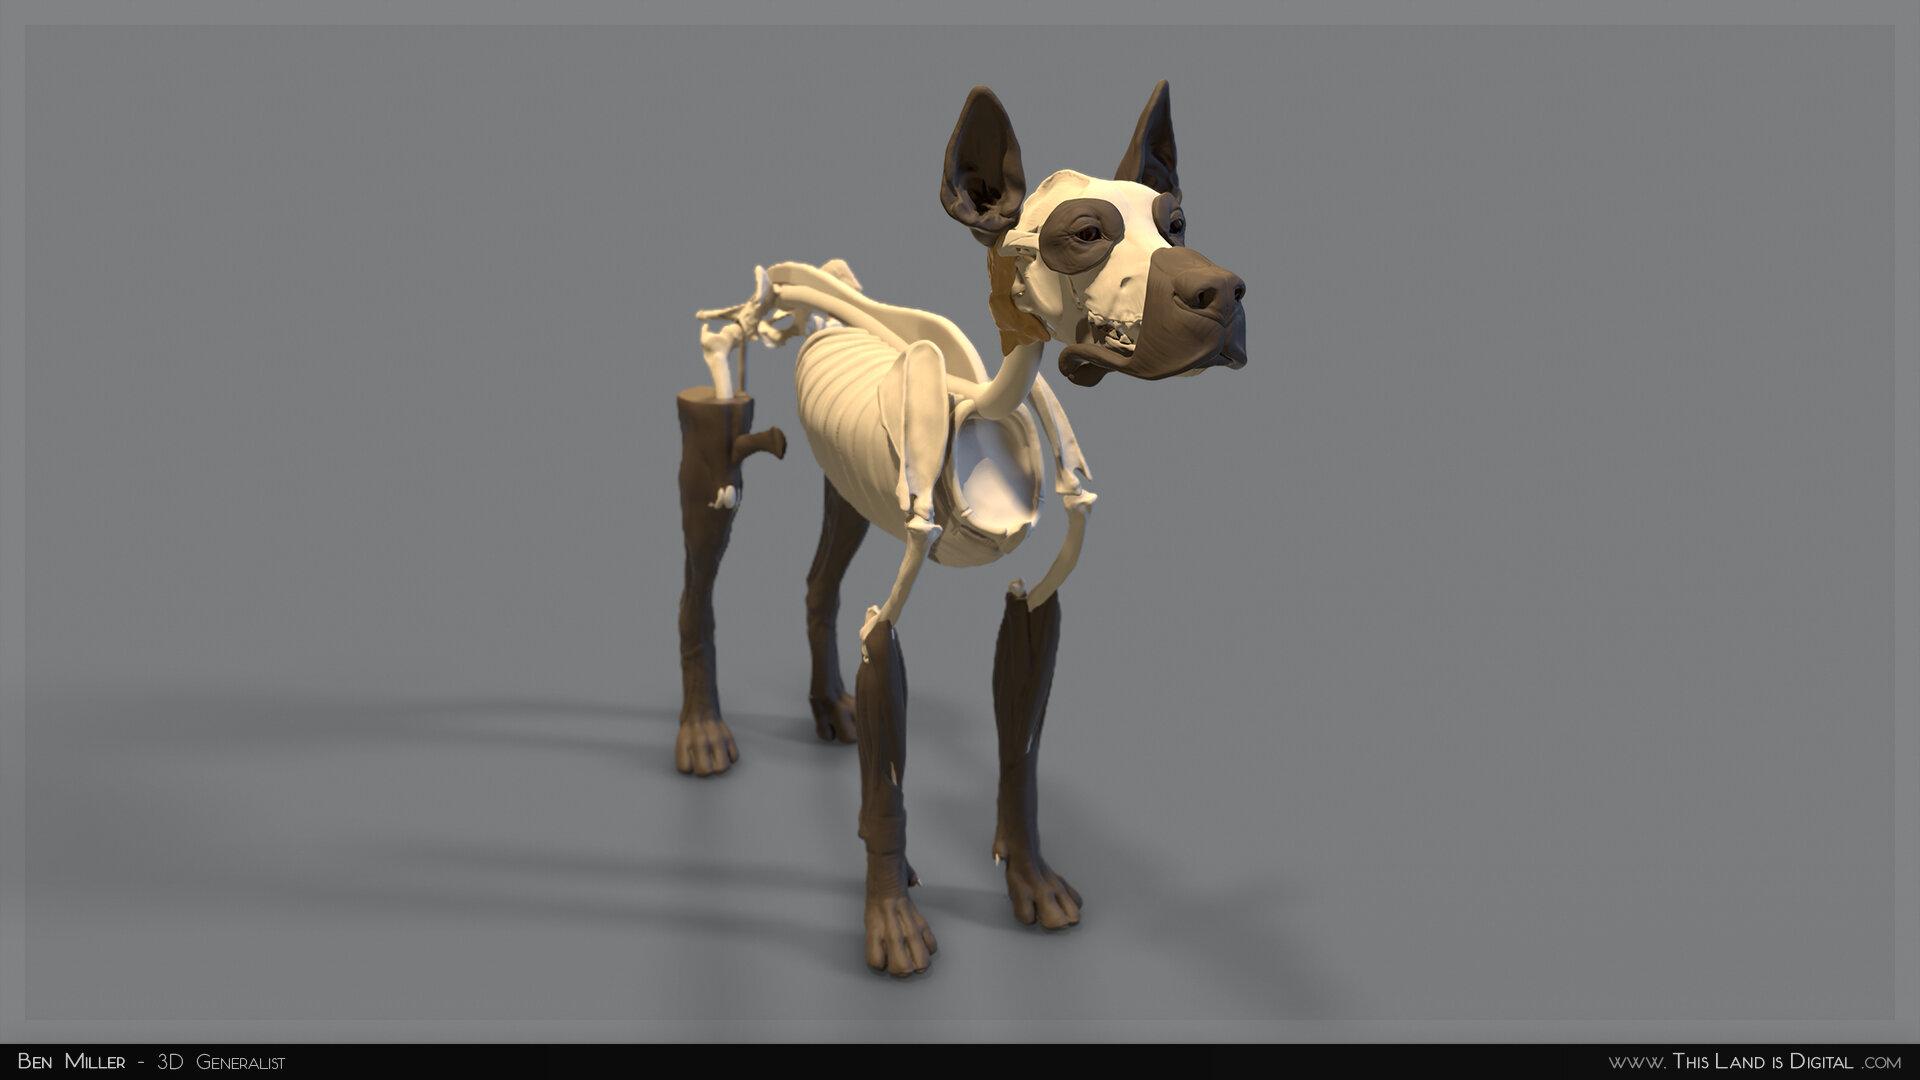 TLiD_BenMiller_AnatomyDogStudy-Skeleton_02.jpg